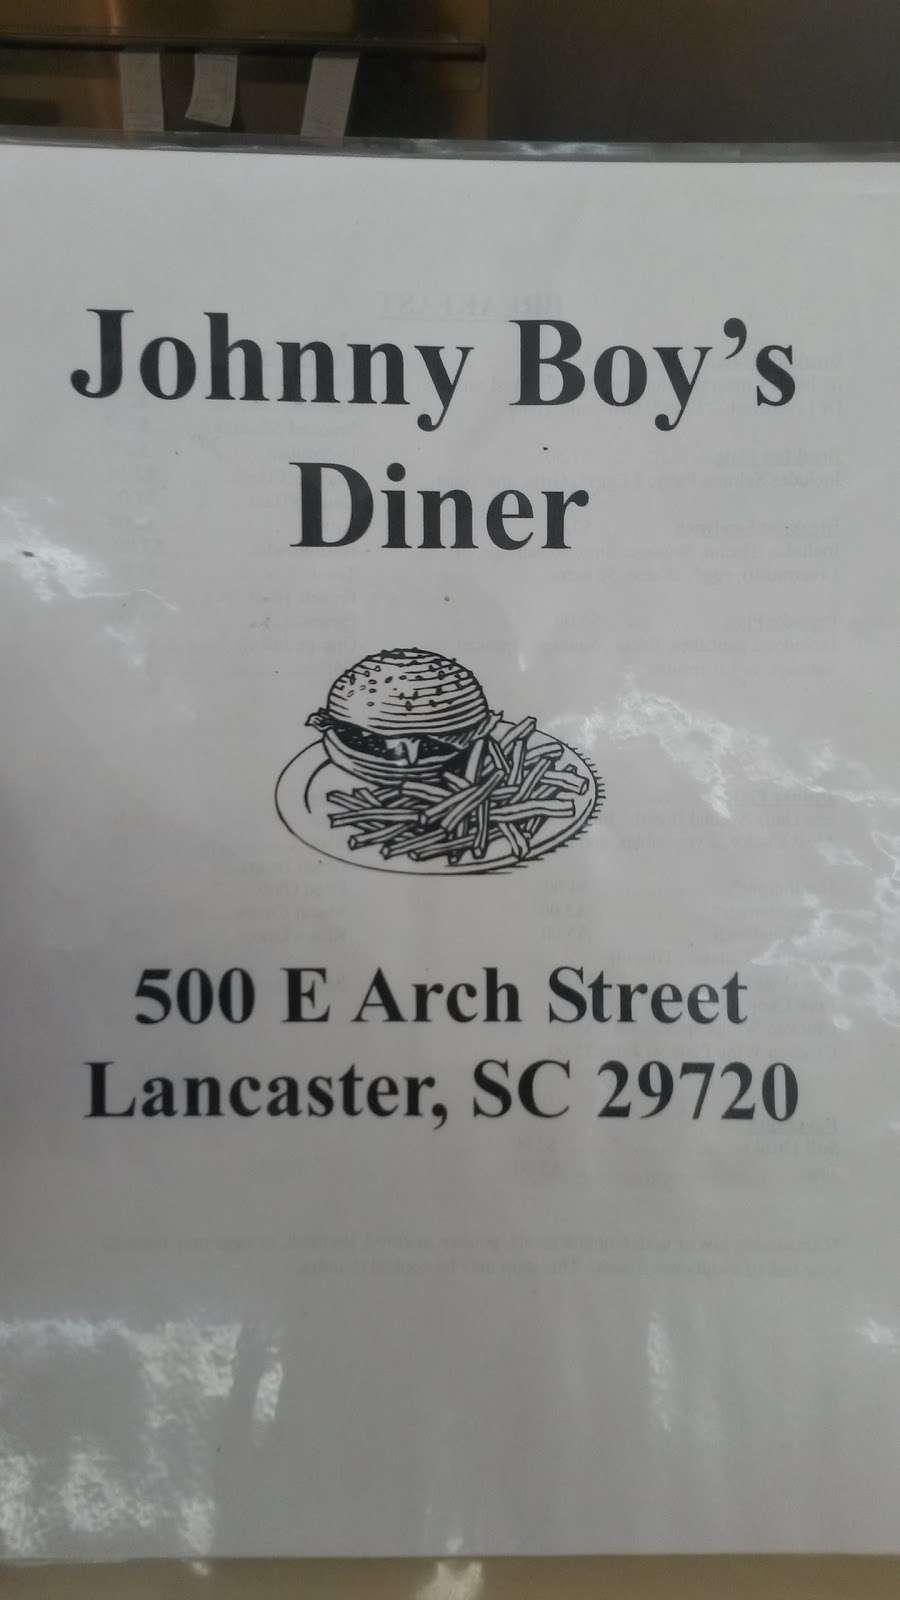 Johnny Boys Diner - restaurant  | Photo 4 of 6 | Address: 500 E Arch St, Lancaster, SC 29720, USA | Phone: (803) 283-0661